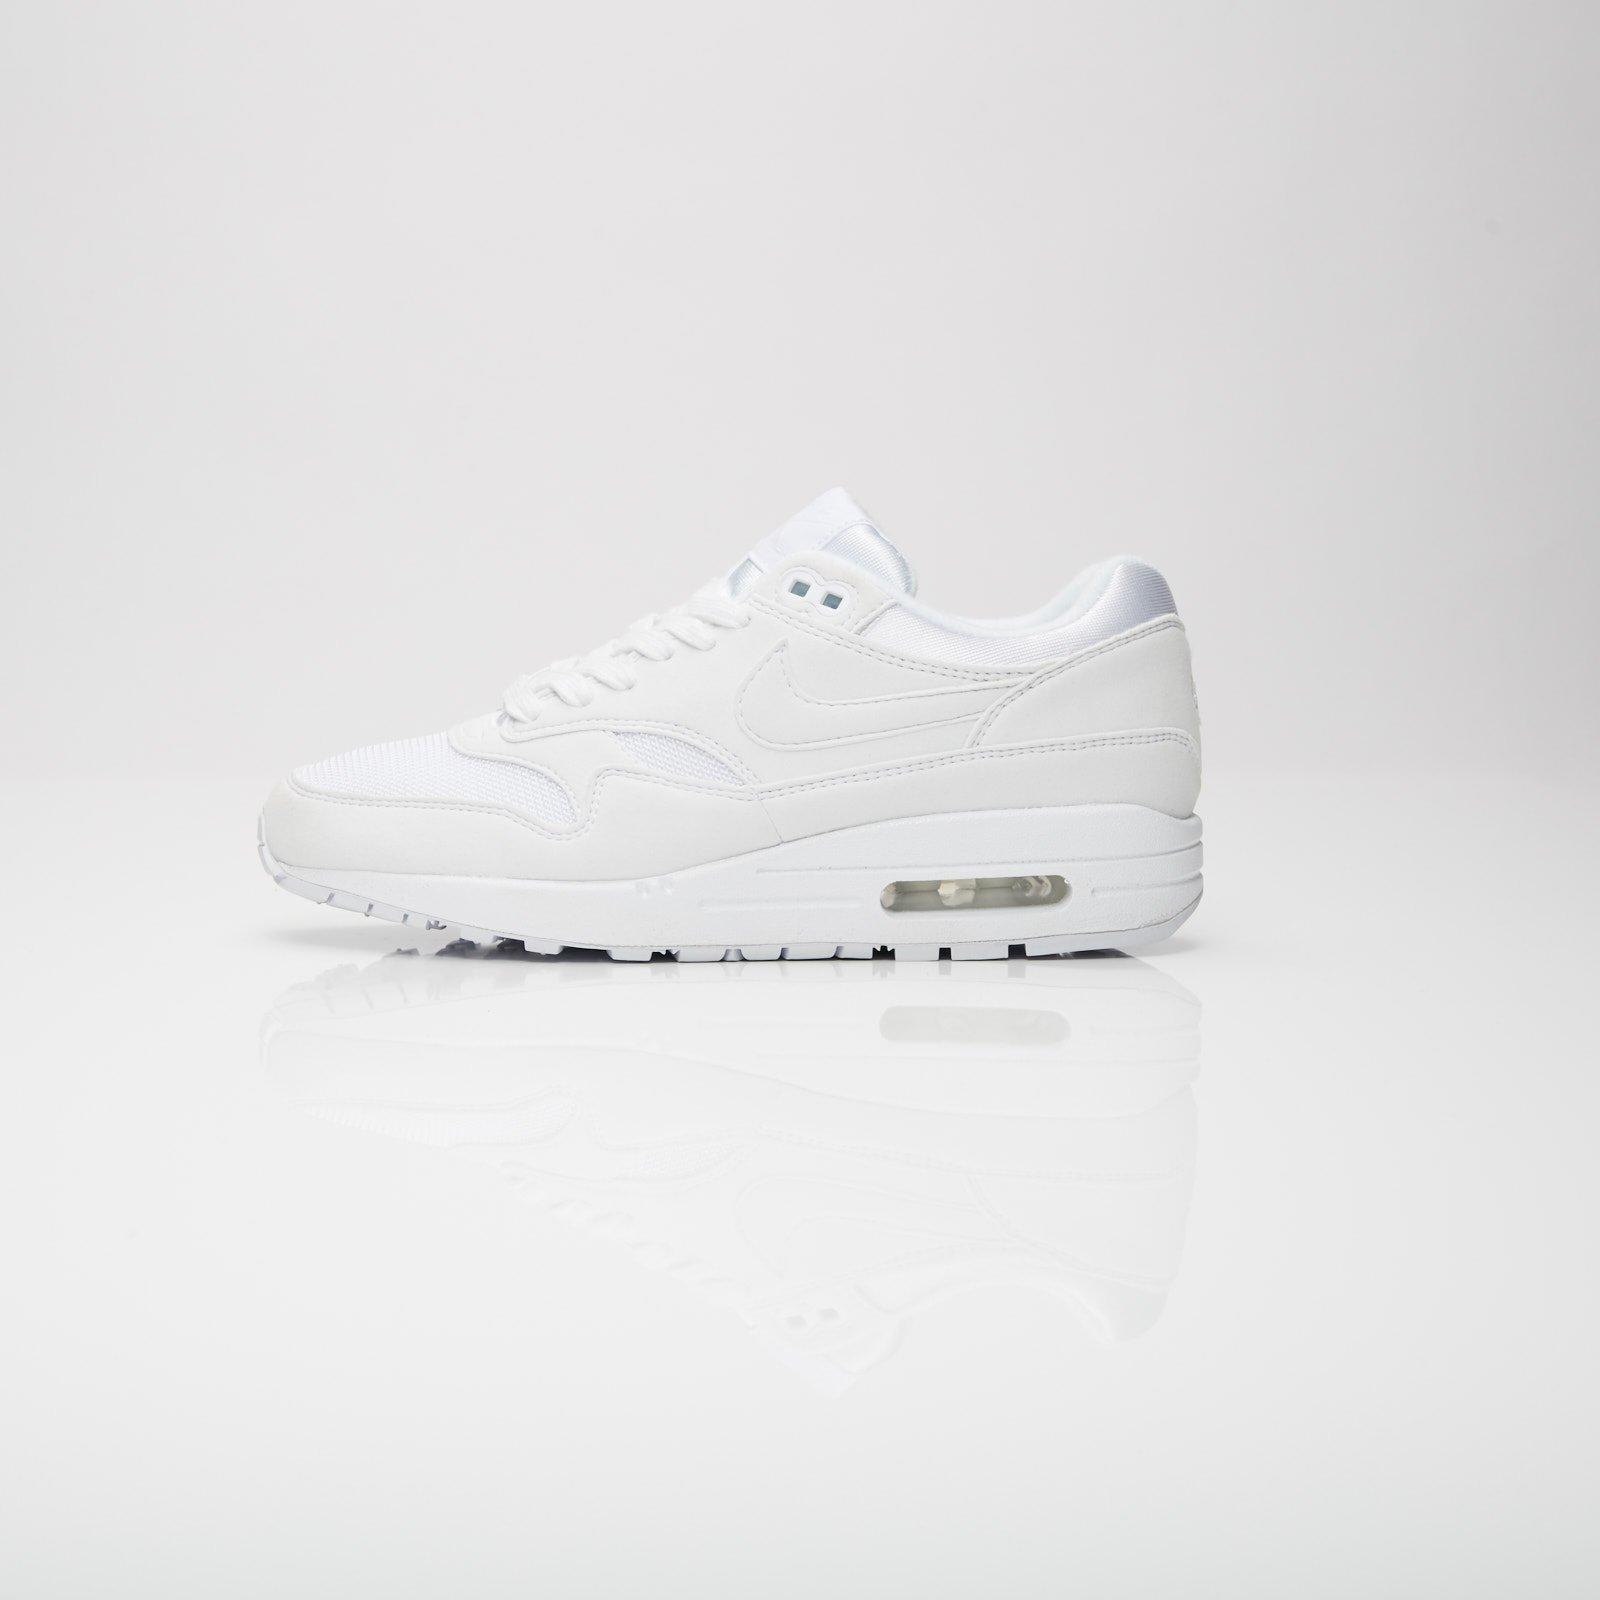 Buy Nike Air Max 1 Wmns 028 319986 028. Online | at